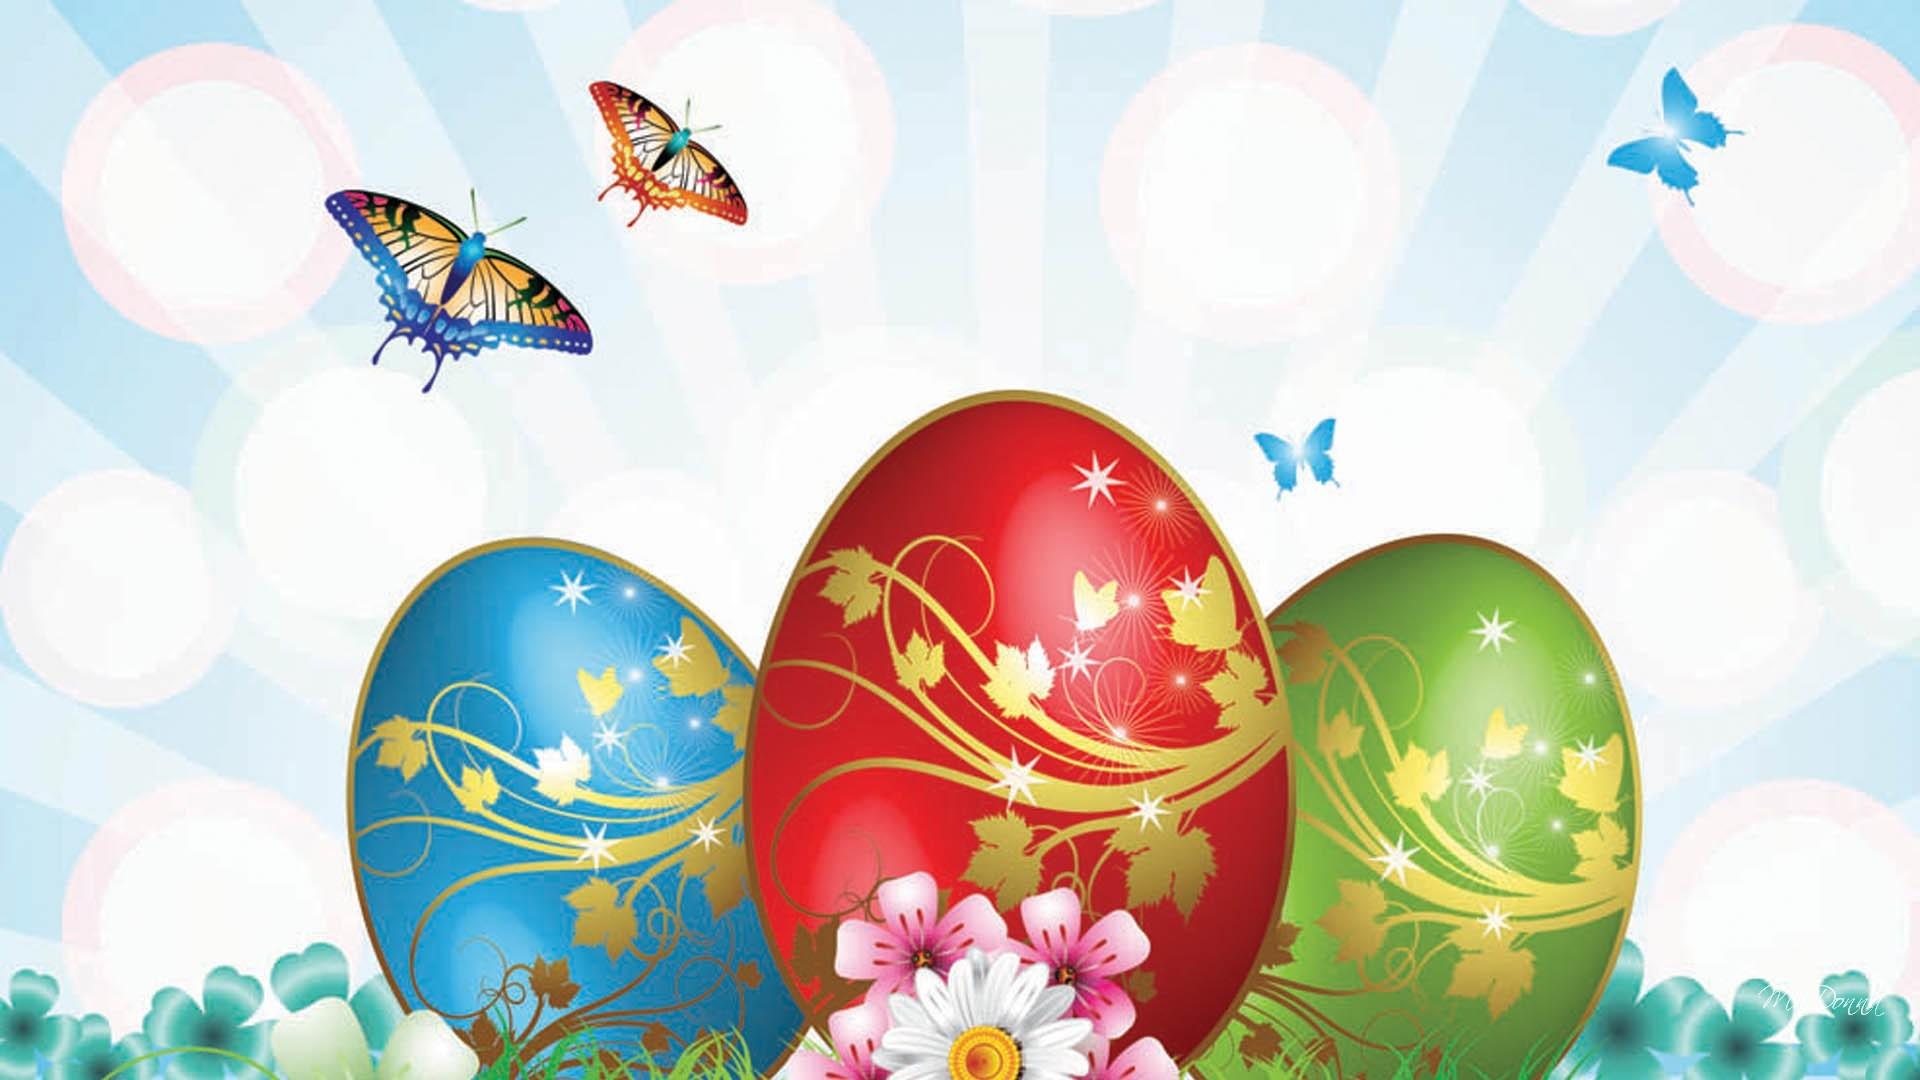 Beautiful animated Easter HD widescreen wallpaper